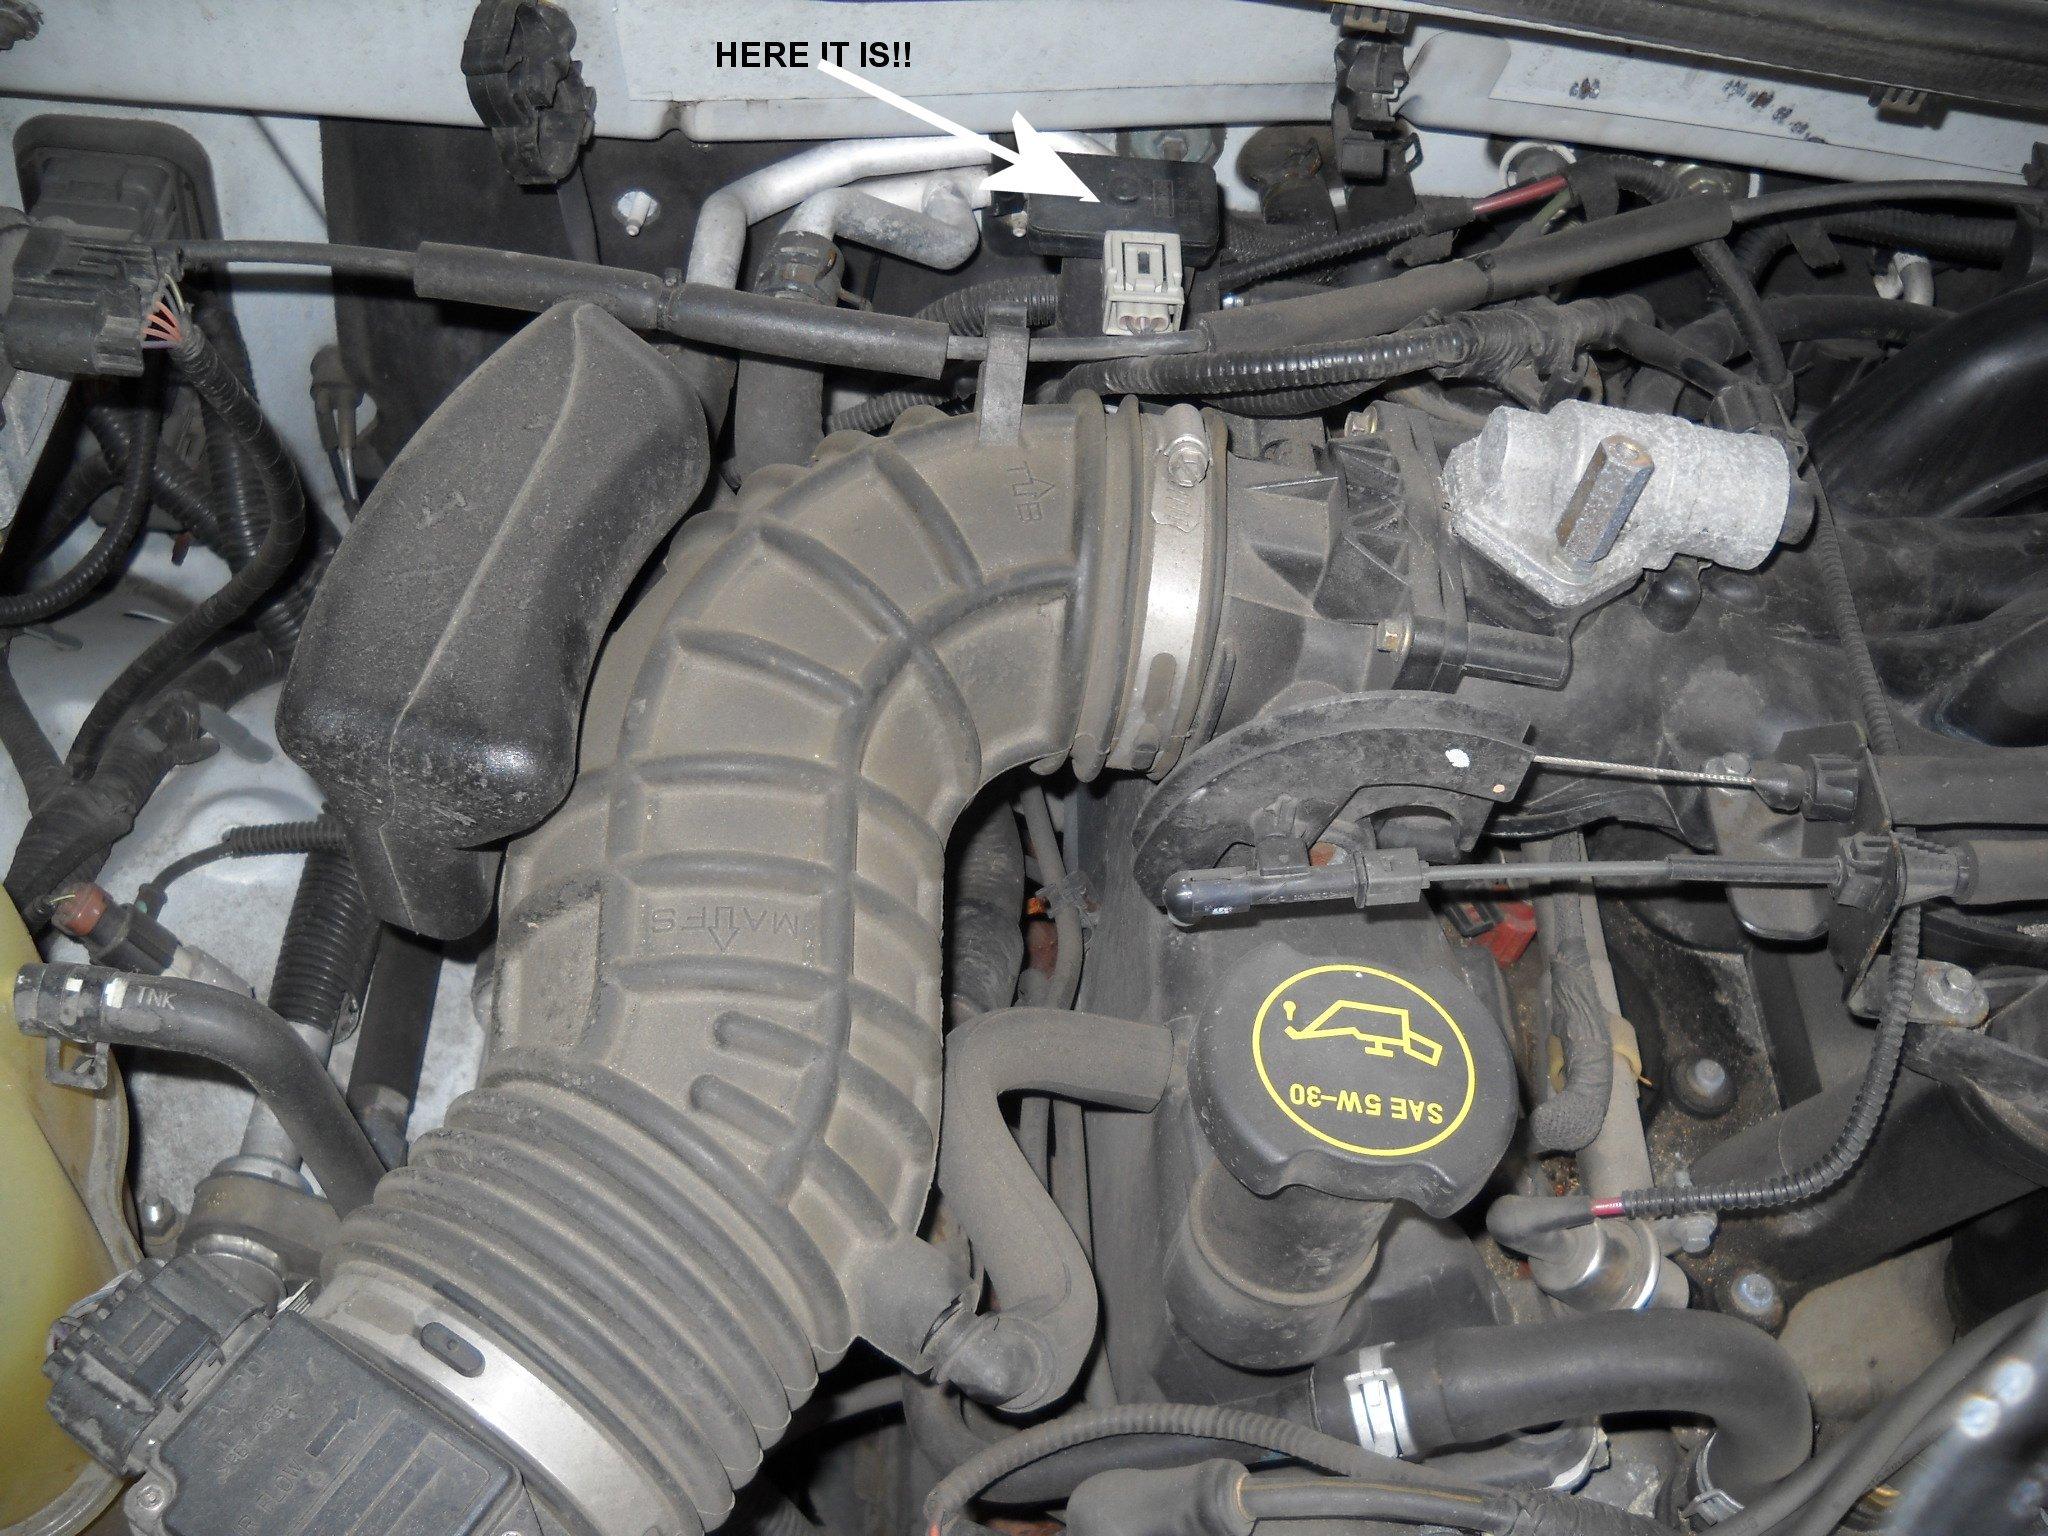 2002 Ford Explorer XLT: V6 4.0L - engine check light..flow